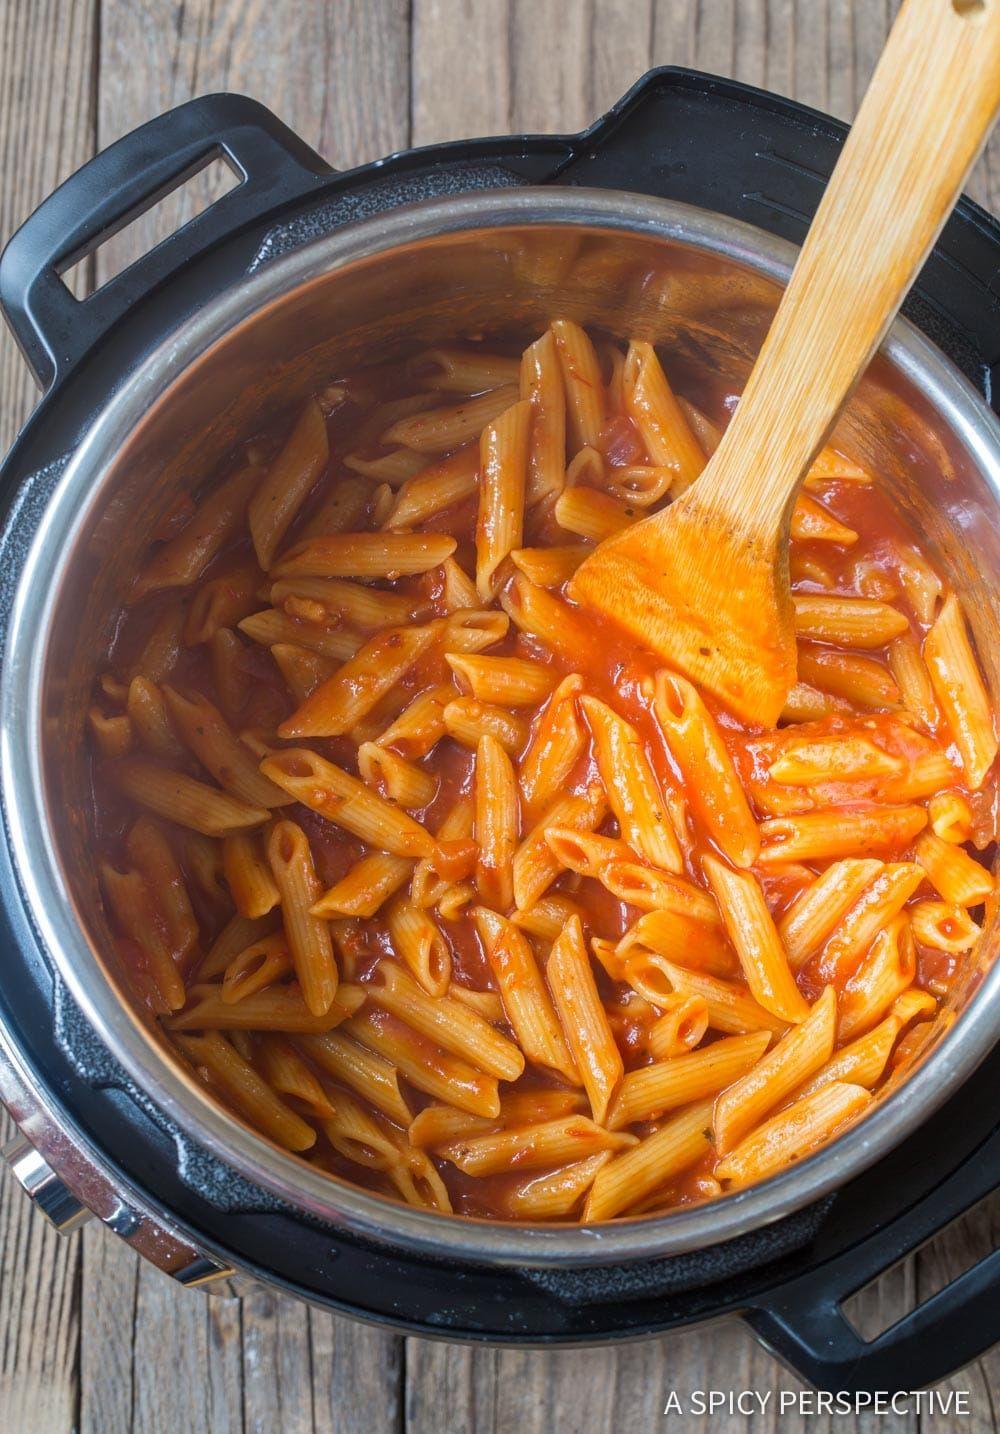 How to make instant pot shrimp pasta with vodka sauce